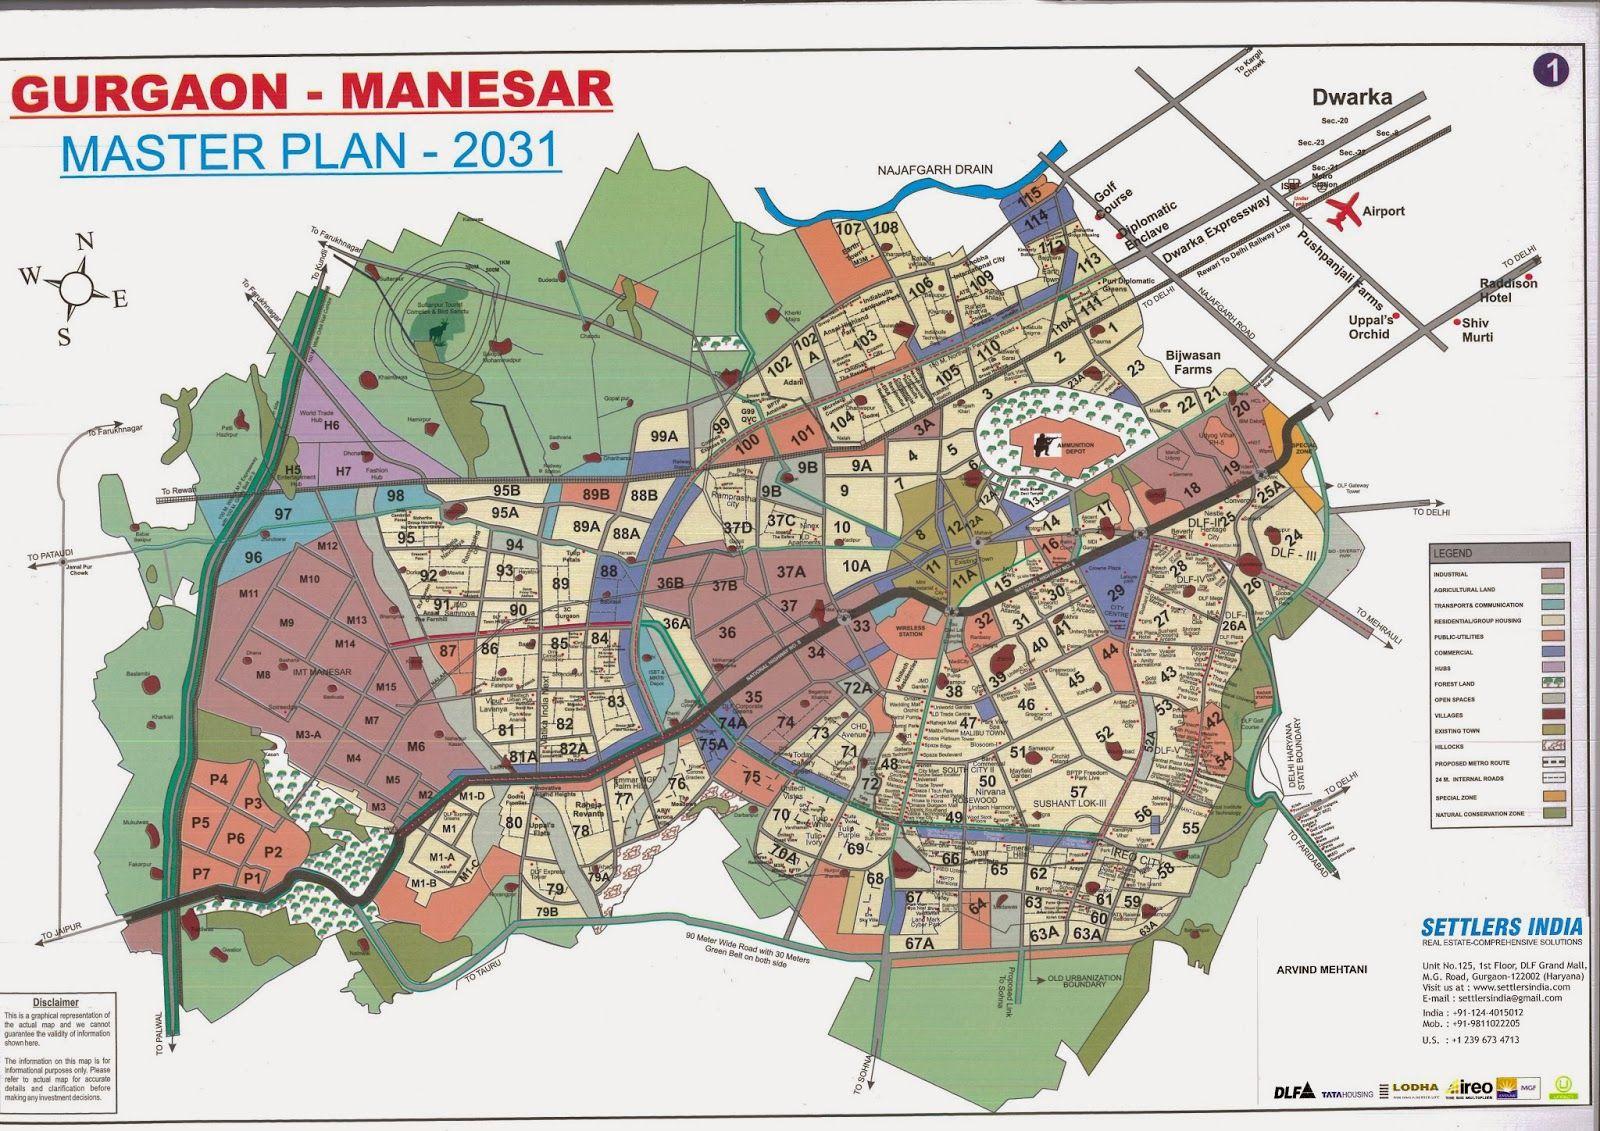 Gurgaon Manesar master Plan 2031 Gurgaon Location Map